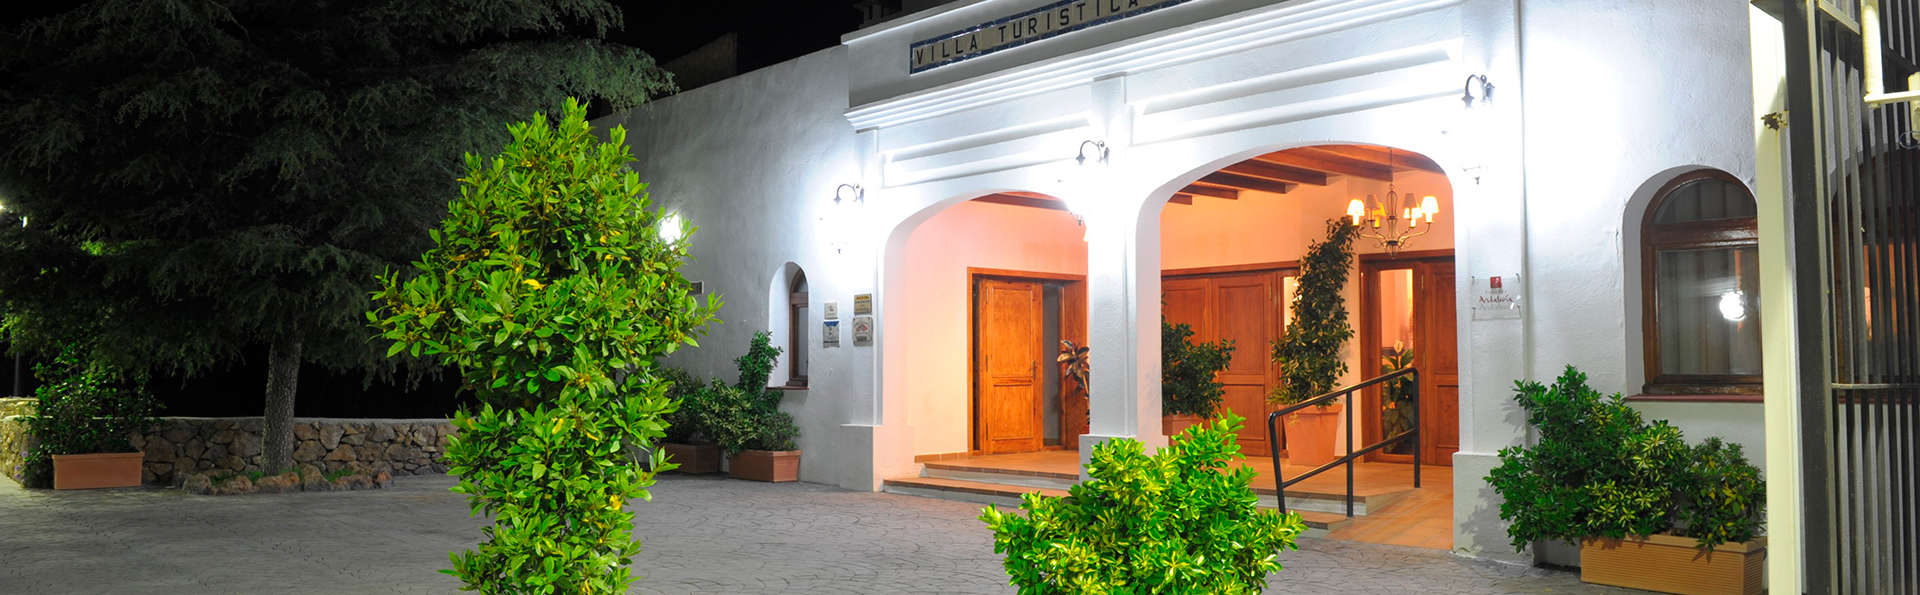 Hotel Villa de Laujar  - EDIT_front.jpg